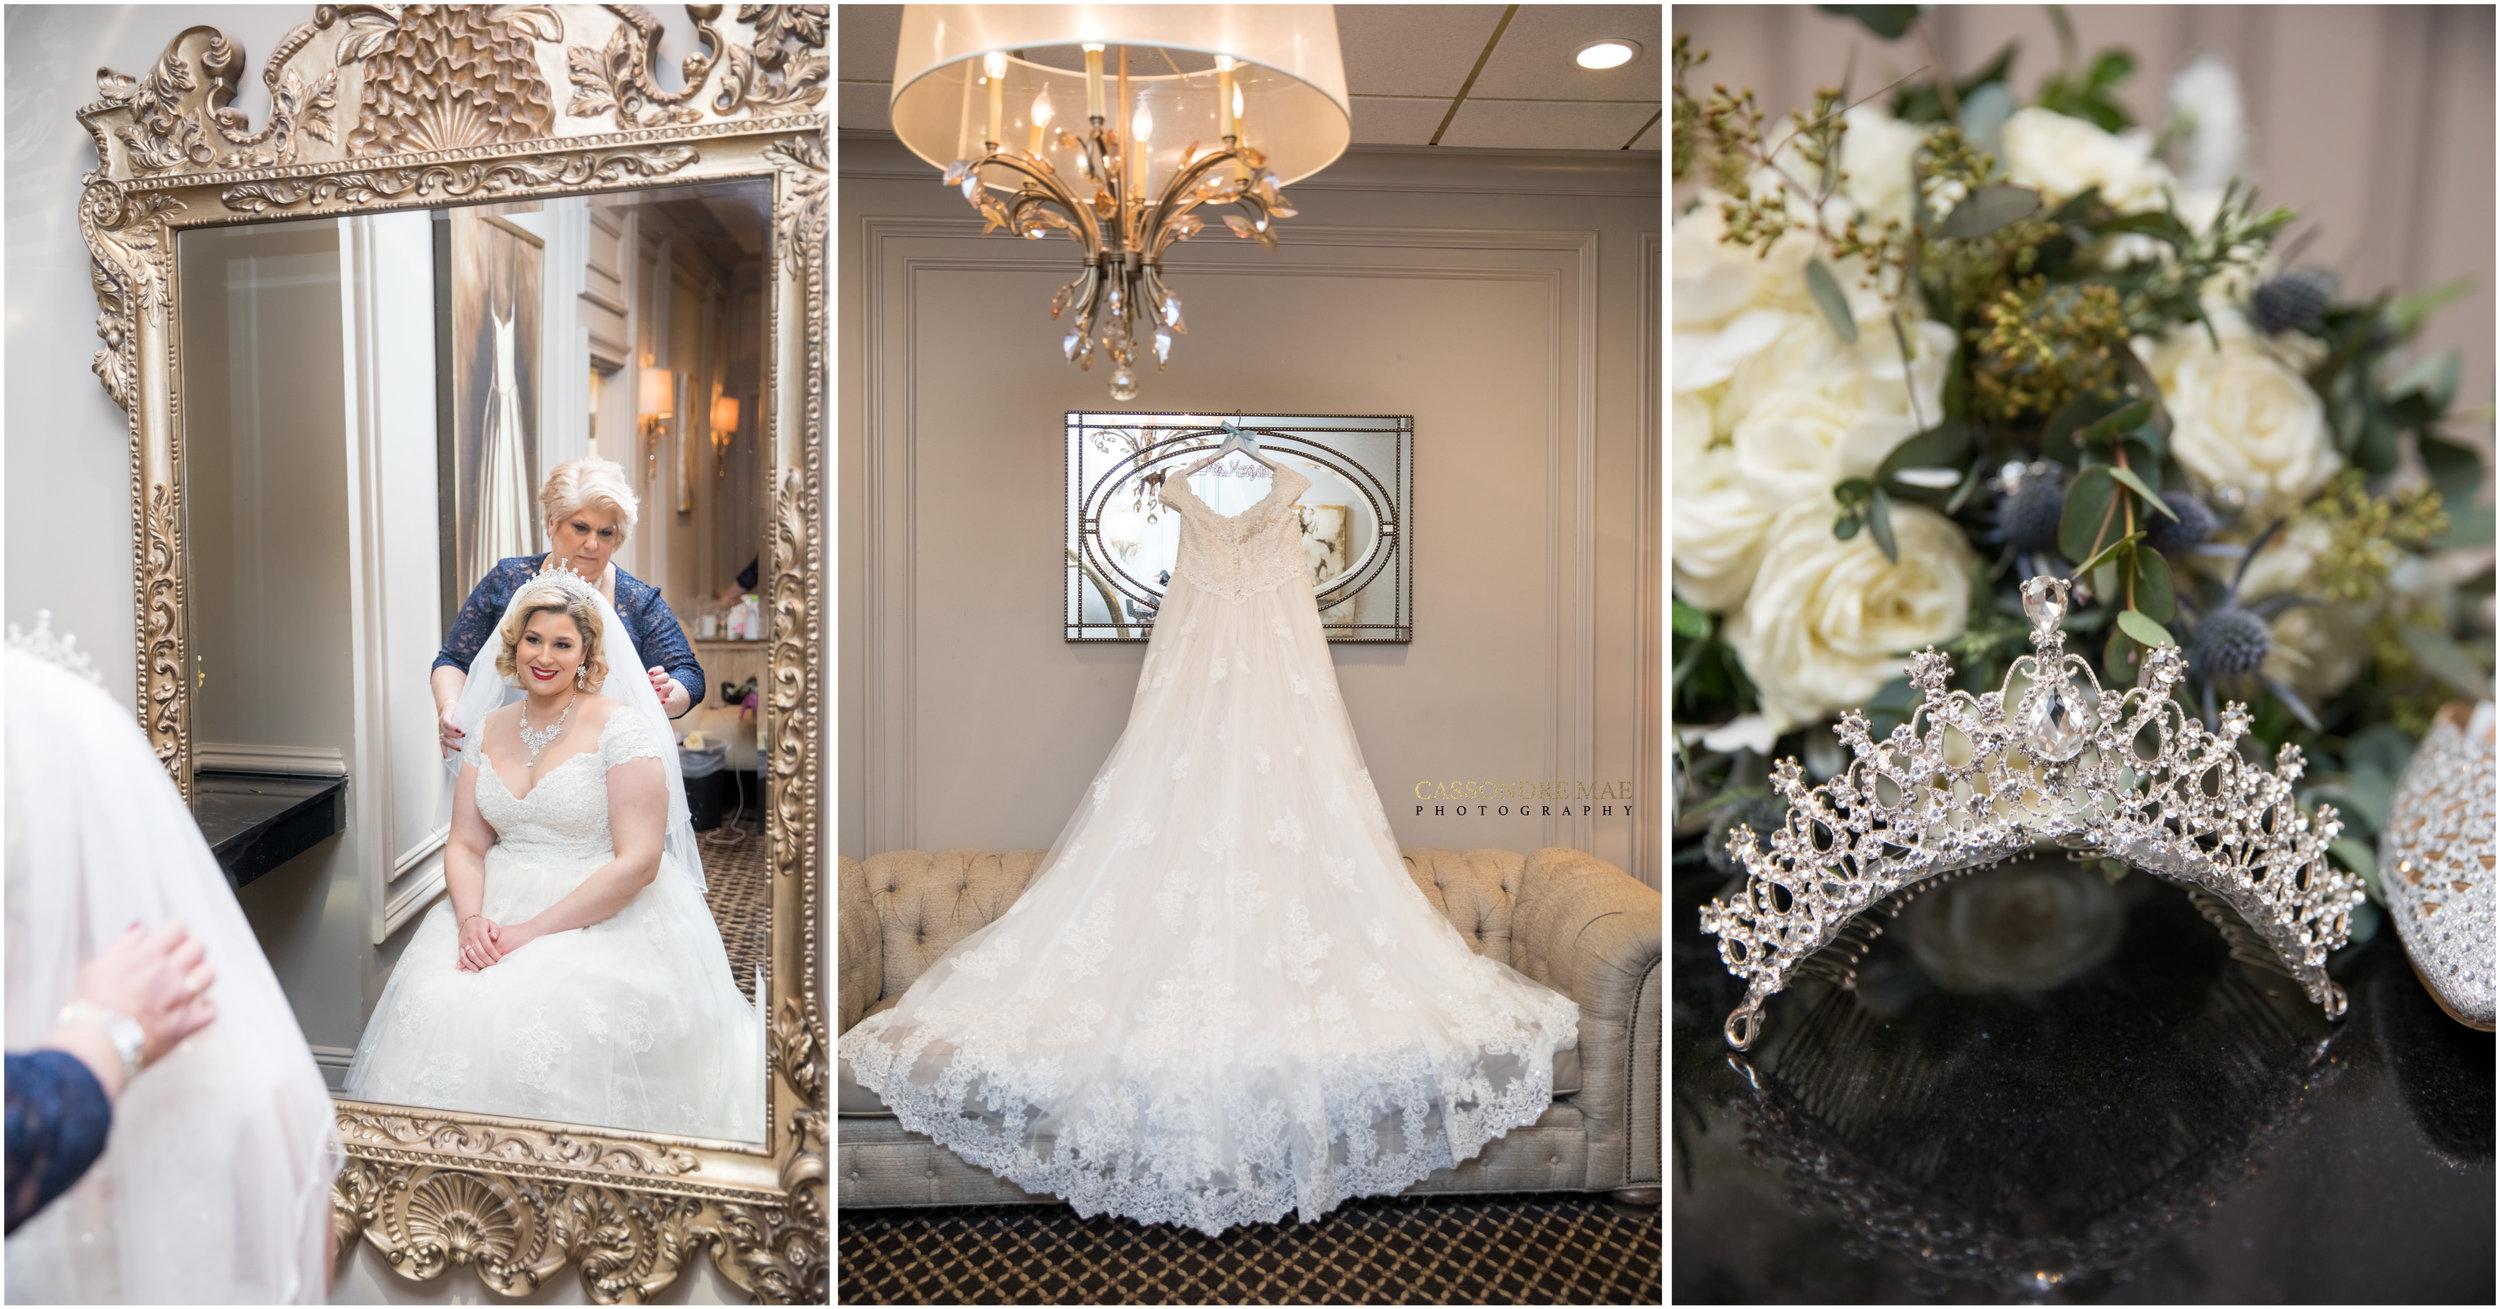 Cassondre Mae Photography Poughkeepsie NY Wedding 8.jpg